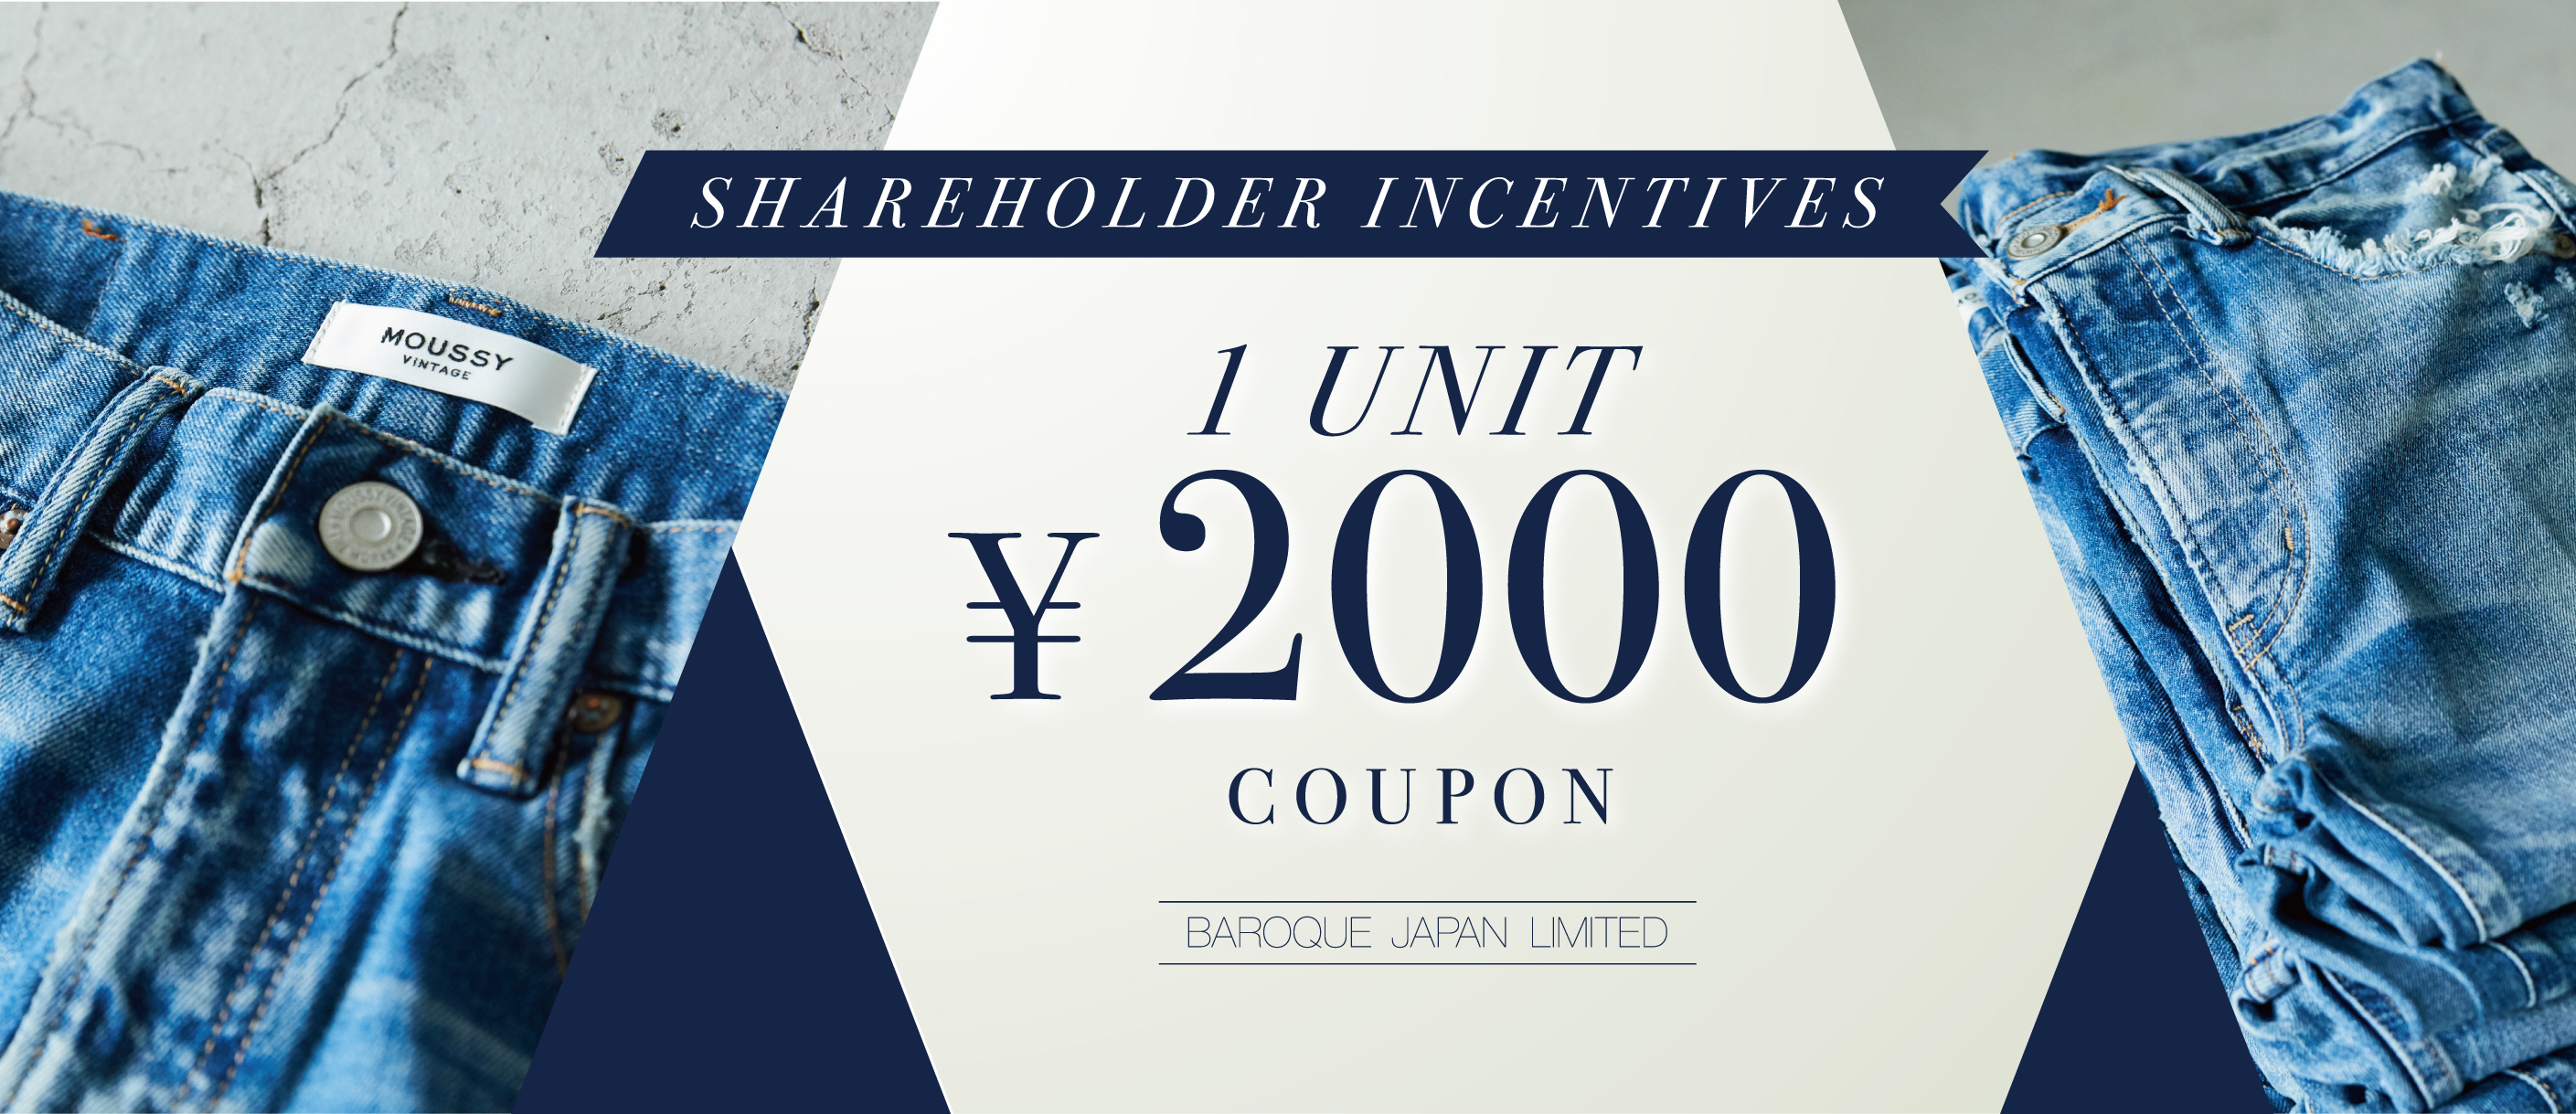 Shareholders' incentive